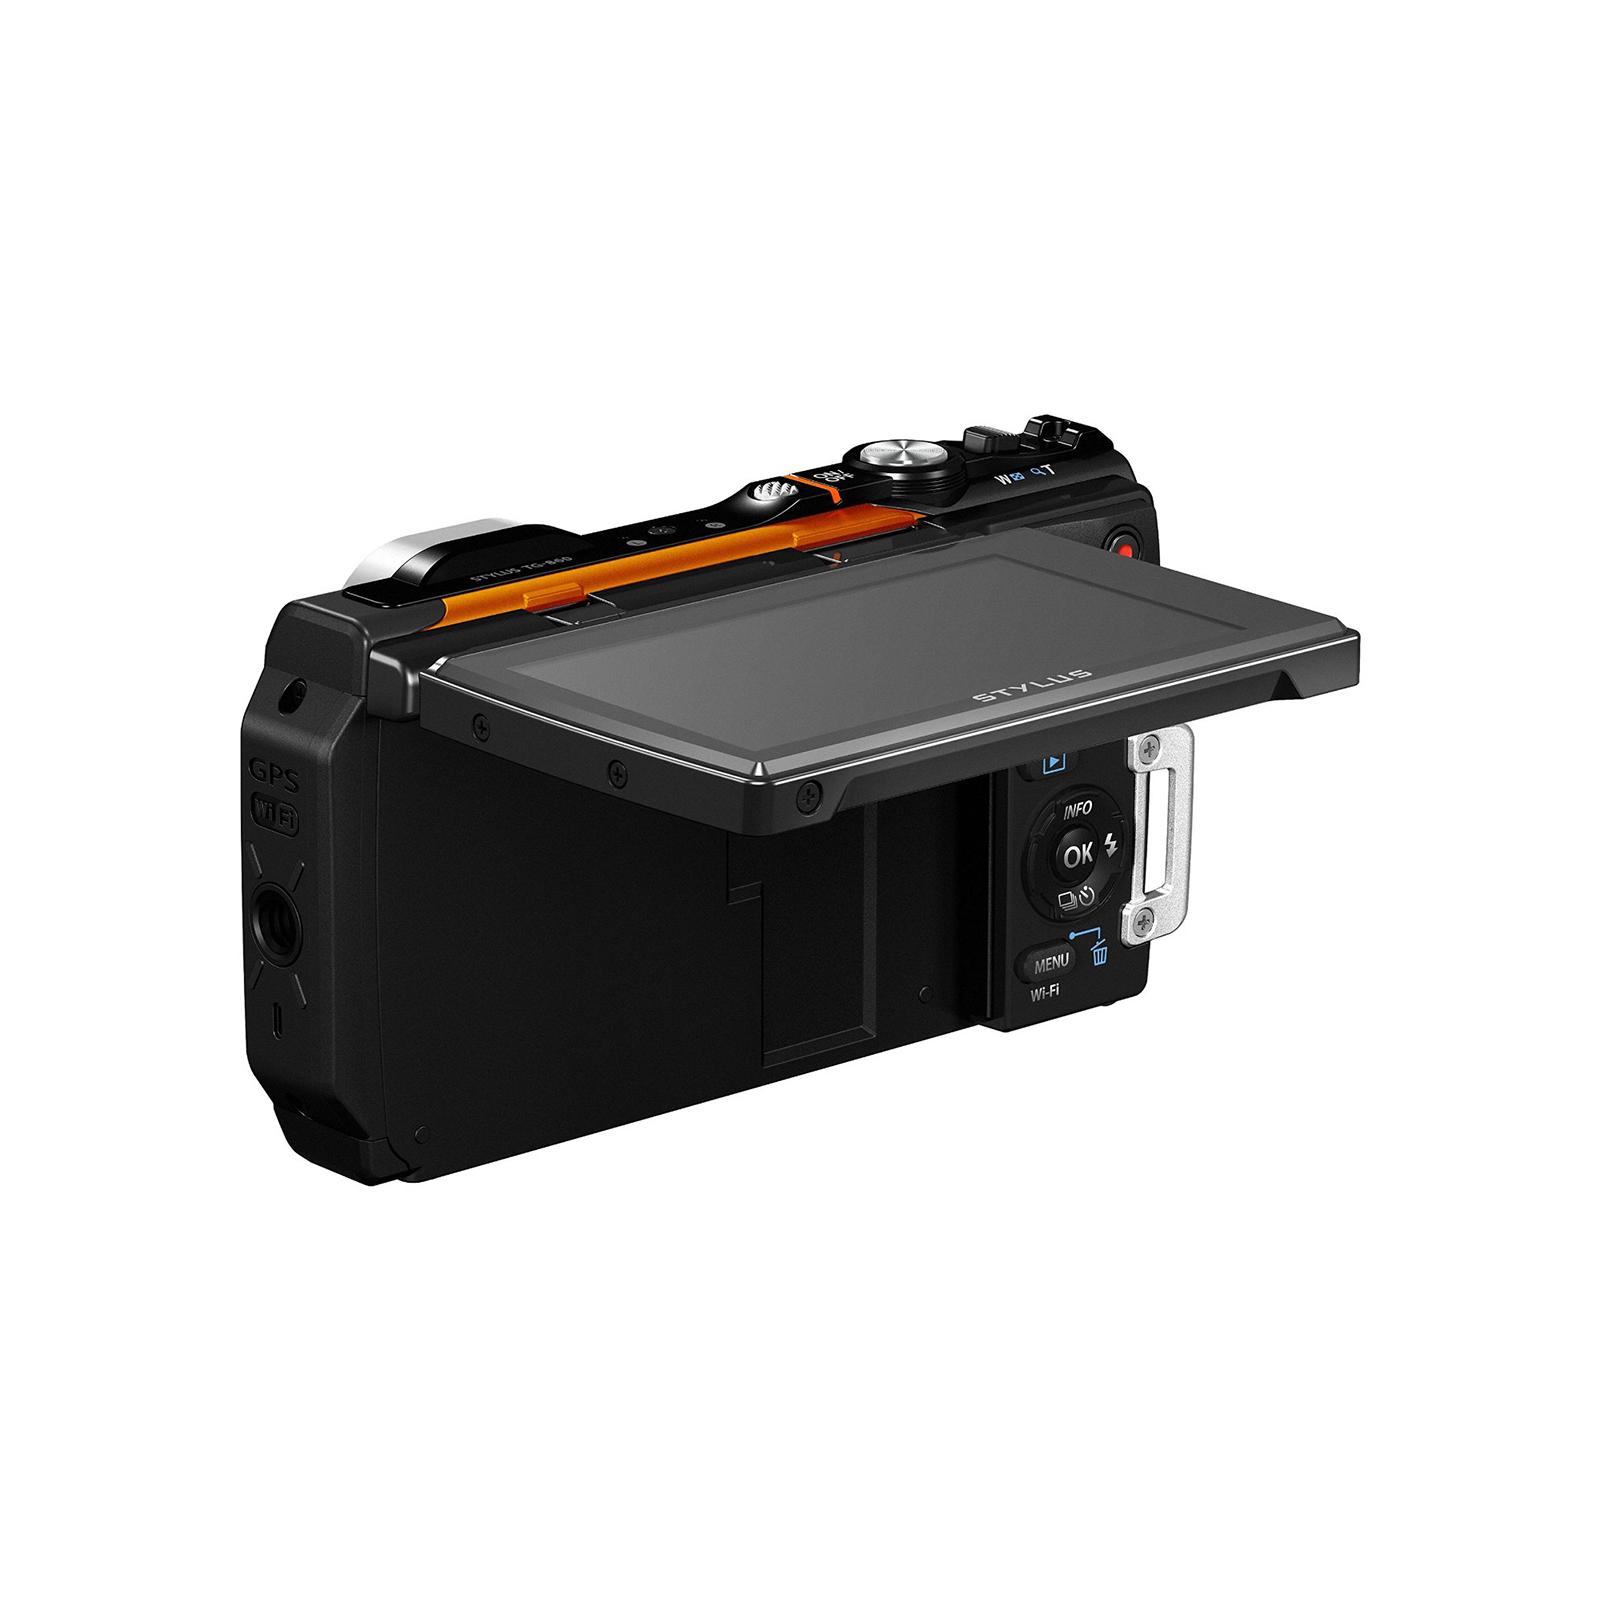 Цифровой фотоаппарат OLYMPUS TG-860 Orange (Waterproof - 15m; iHS; Wi-Fi) (V104170OE000) изображение 6